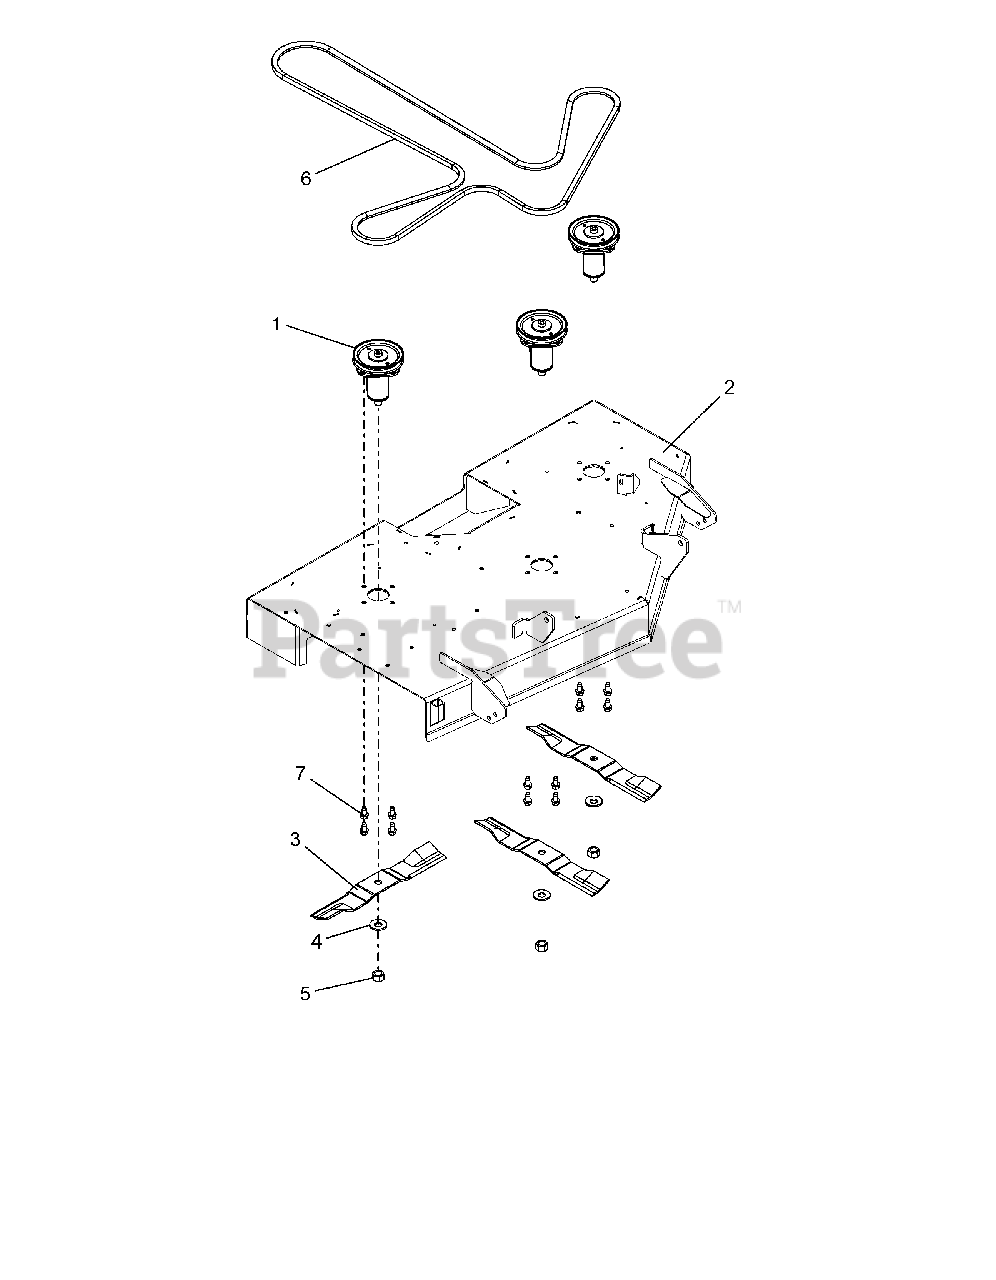 Gravely Drive Belt Diagram : gravely, drive, diagram, Gravely, 915172, Zero-Turn, Mower,, Kohler, 040000, Above), Deck,, Belt,, Blades, Spindles, Parts, Lookup, Diagrams, PartsTree